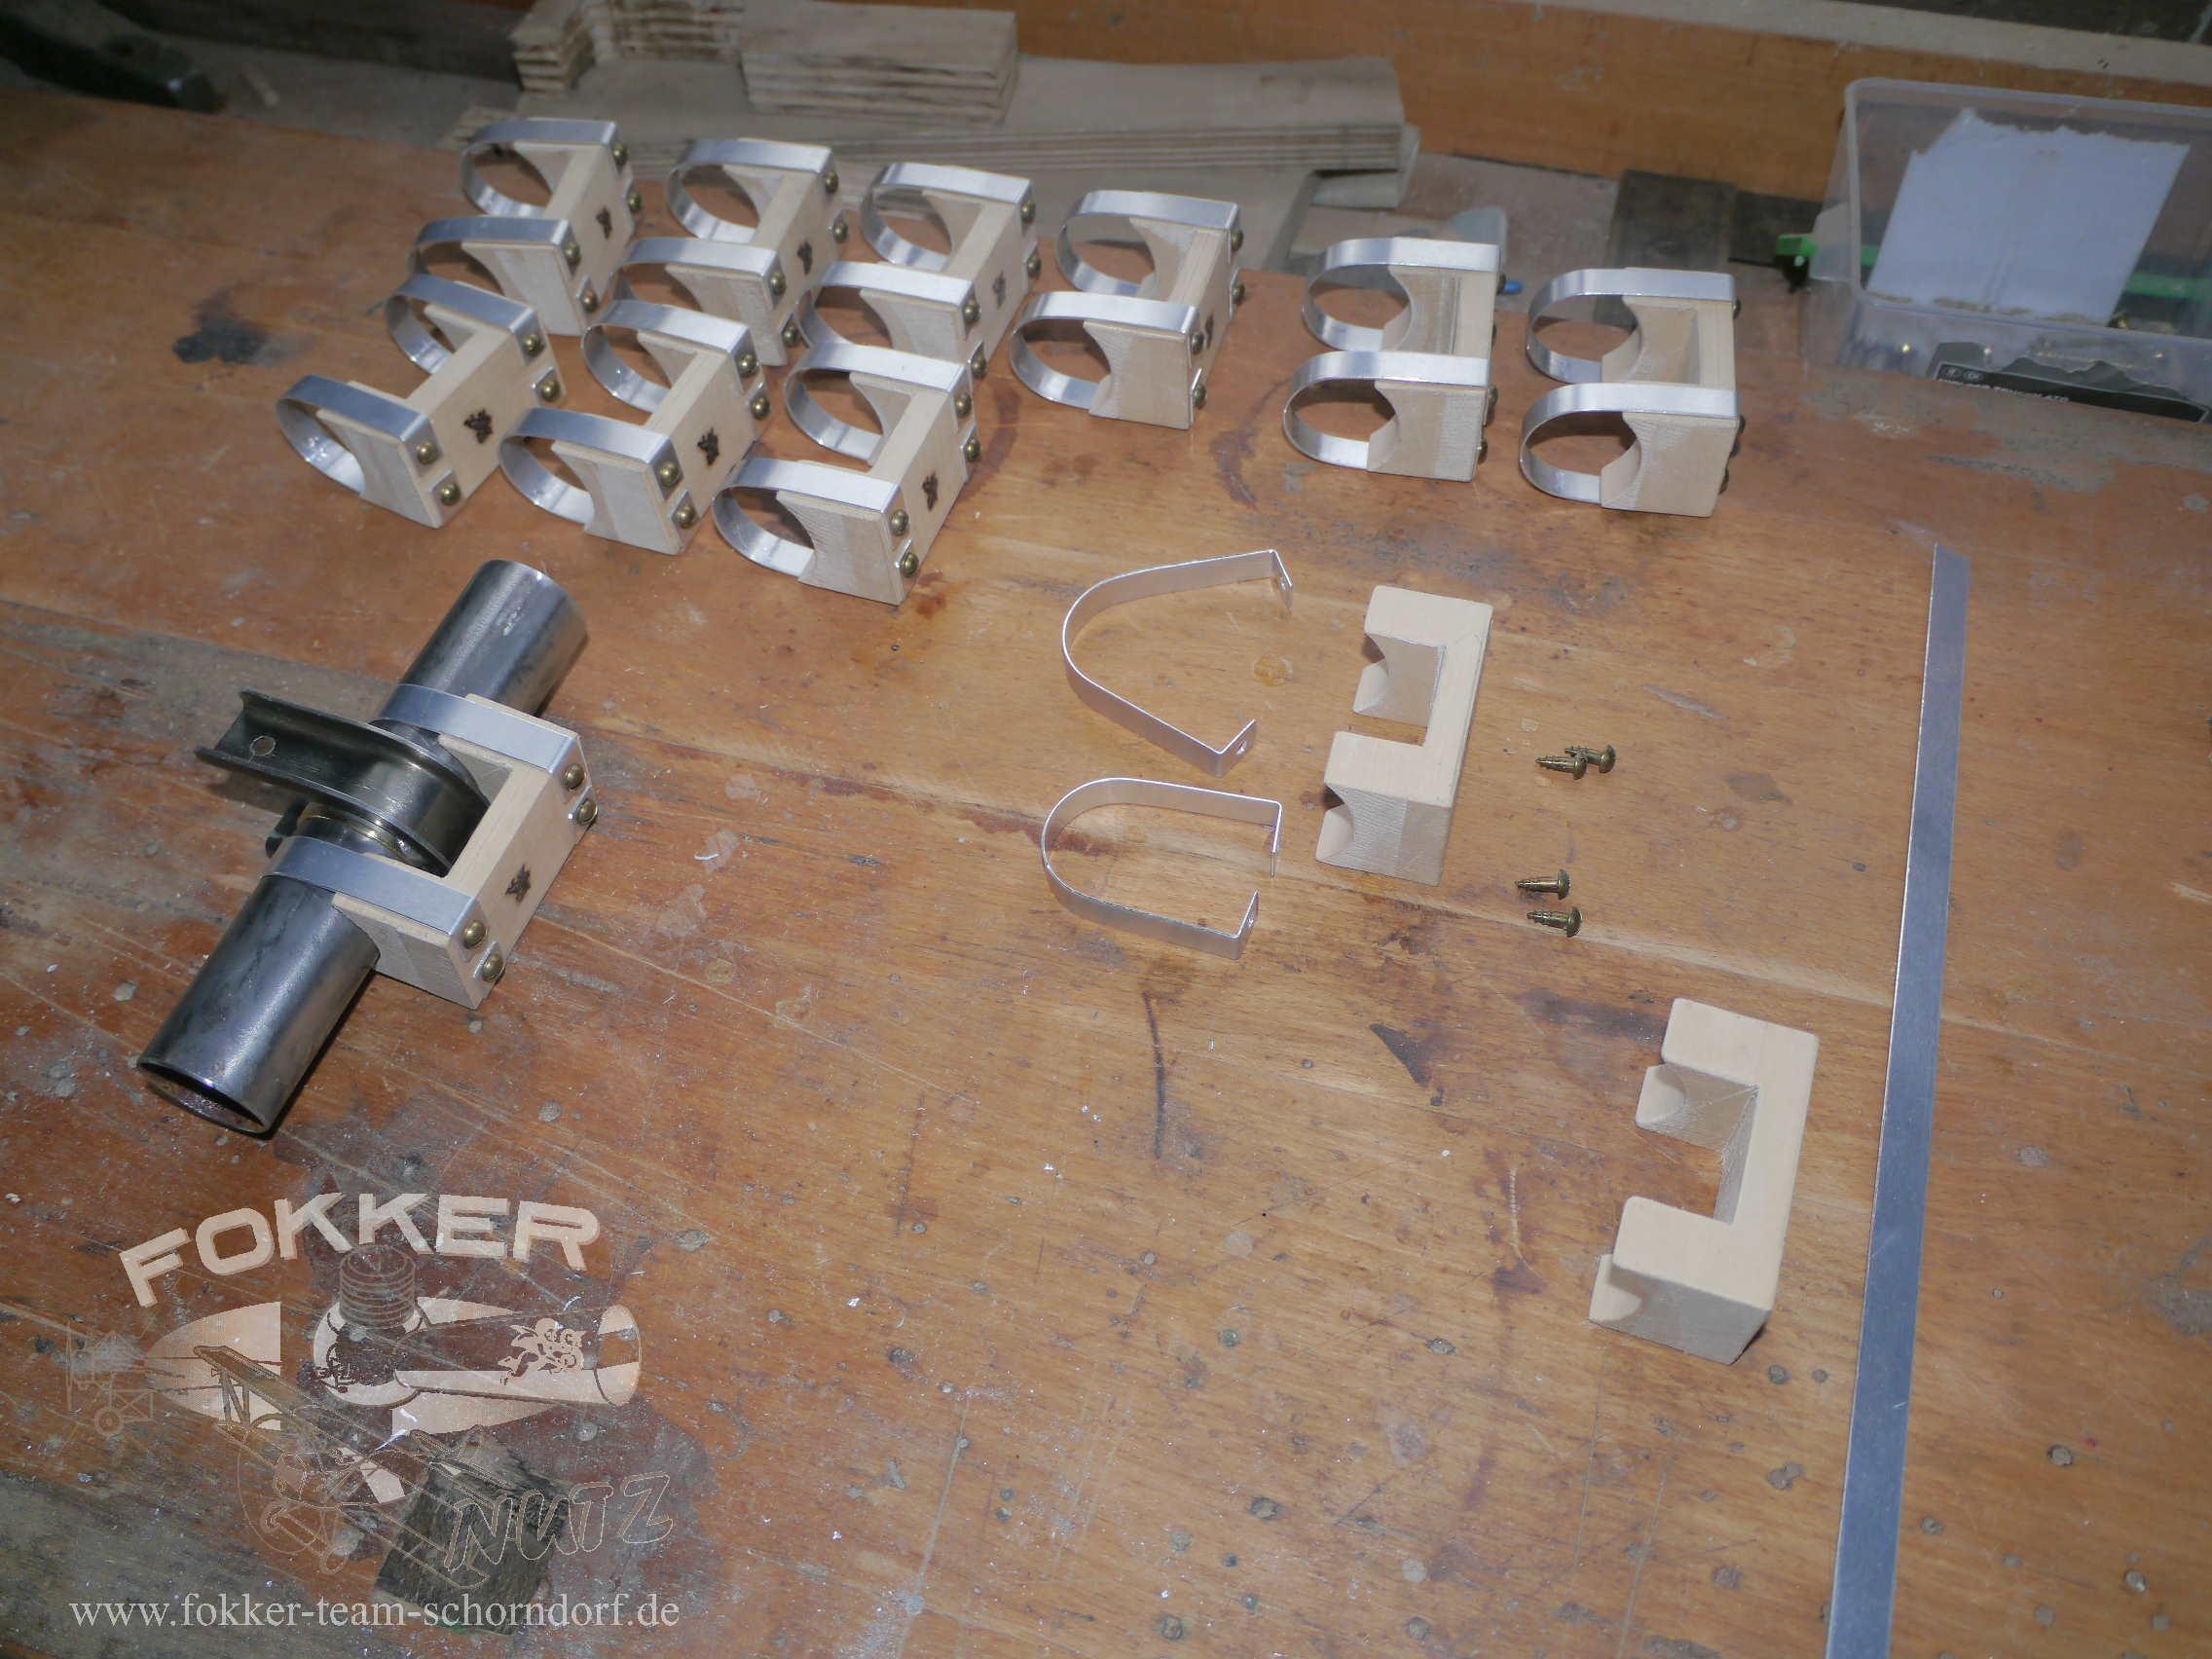 Engels E.1 (Fokker Dr.1) - Aileron strap blocks in the making